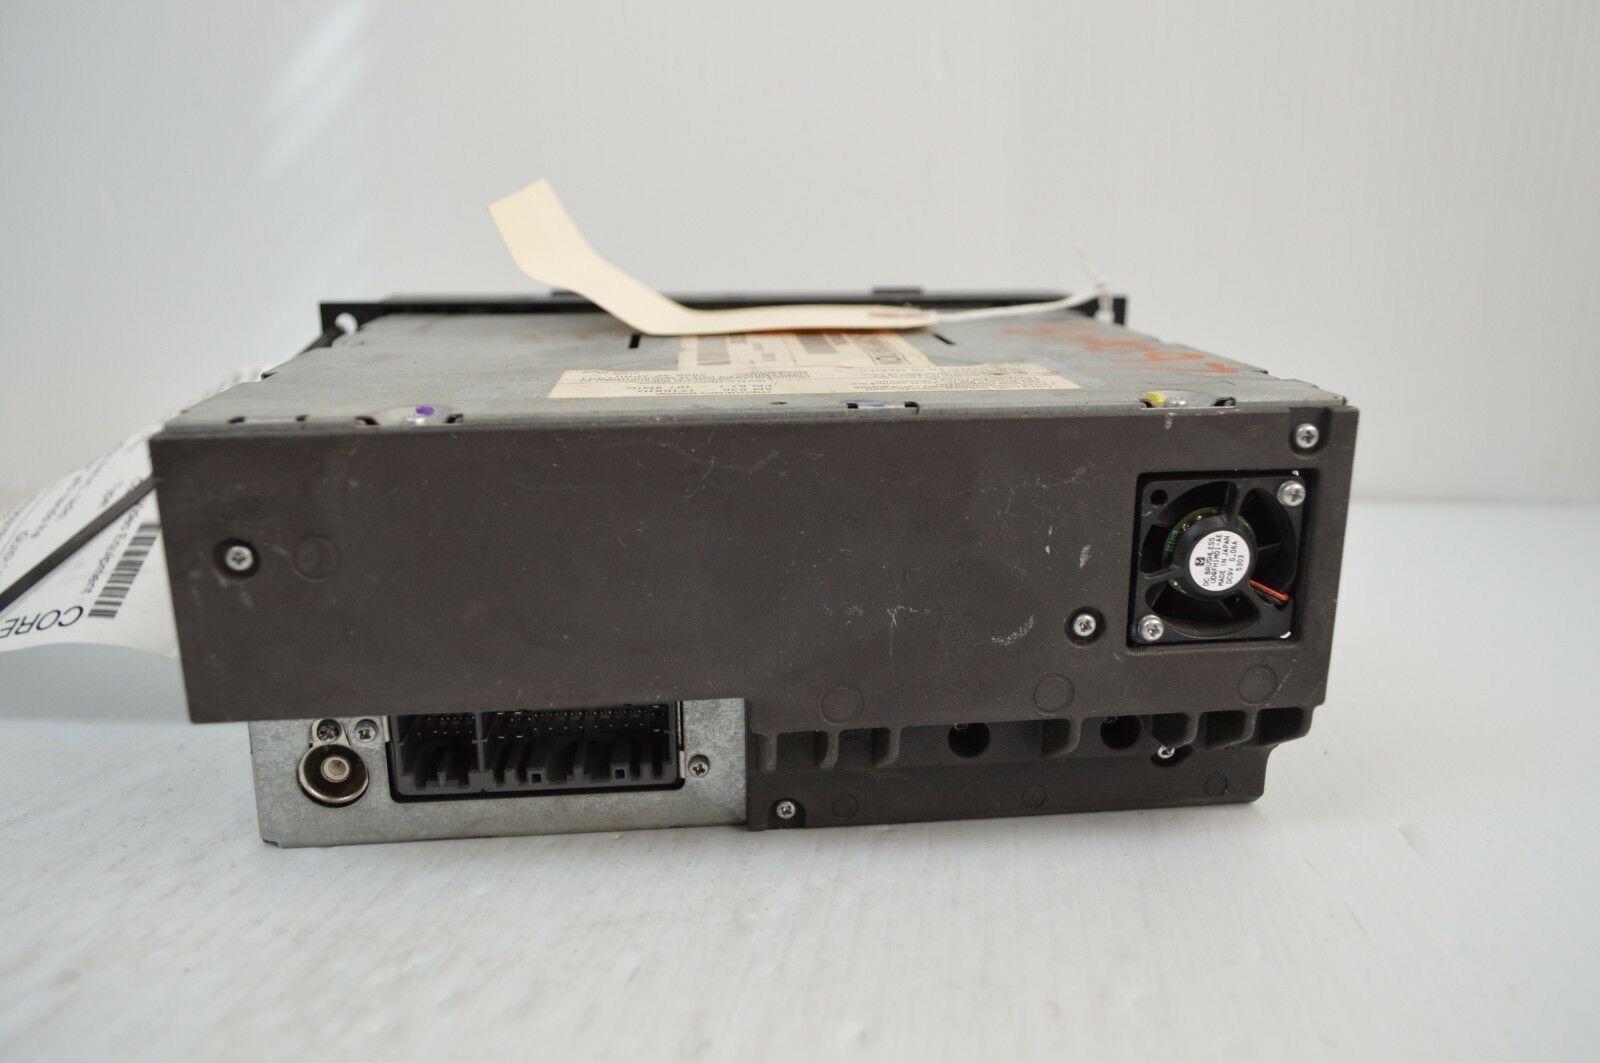 2005-2007 CHRYSLER DODGE RADIO 6 CD MP3 CASSETTE PLAYER TESTD 5091523AL AA36#016 image 4